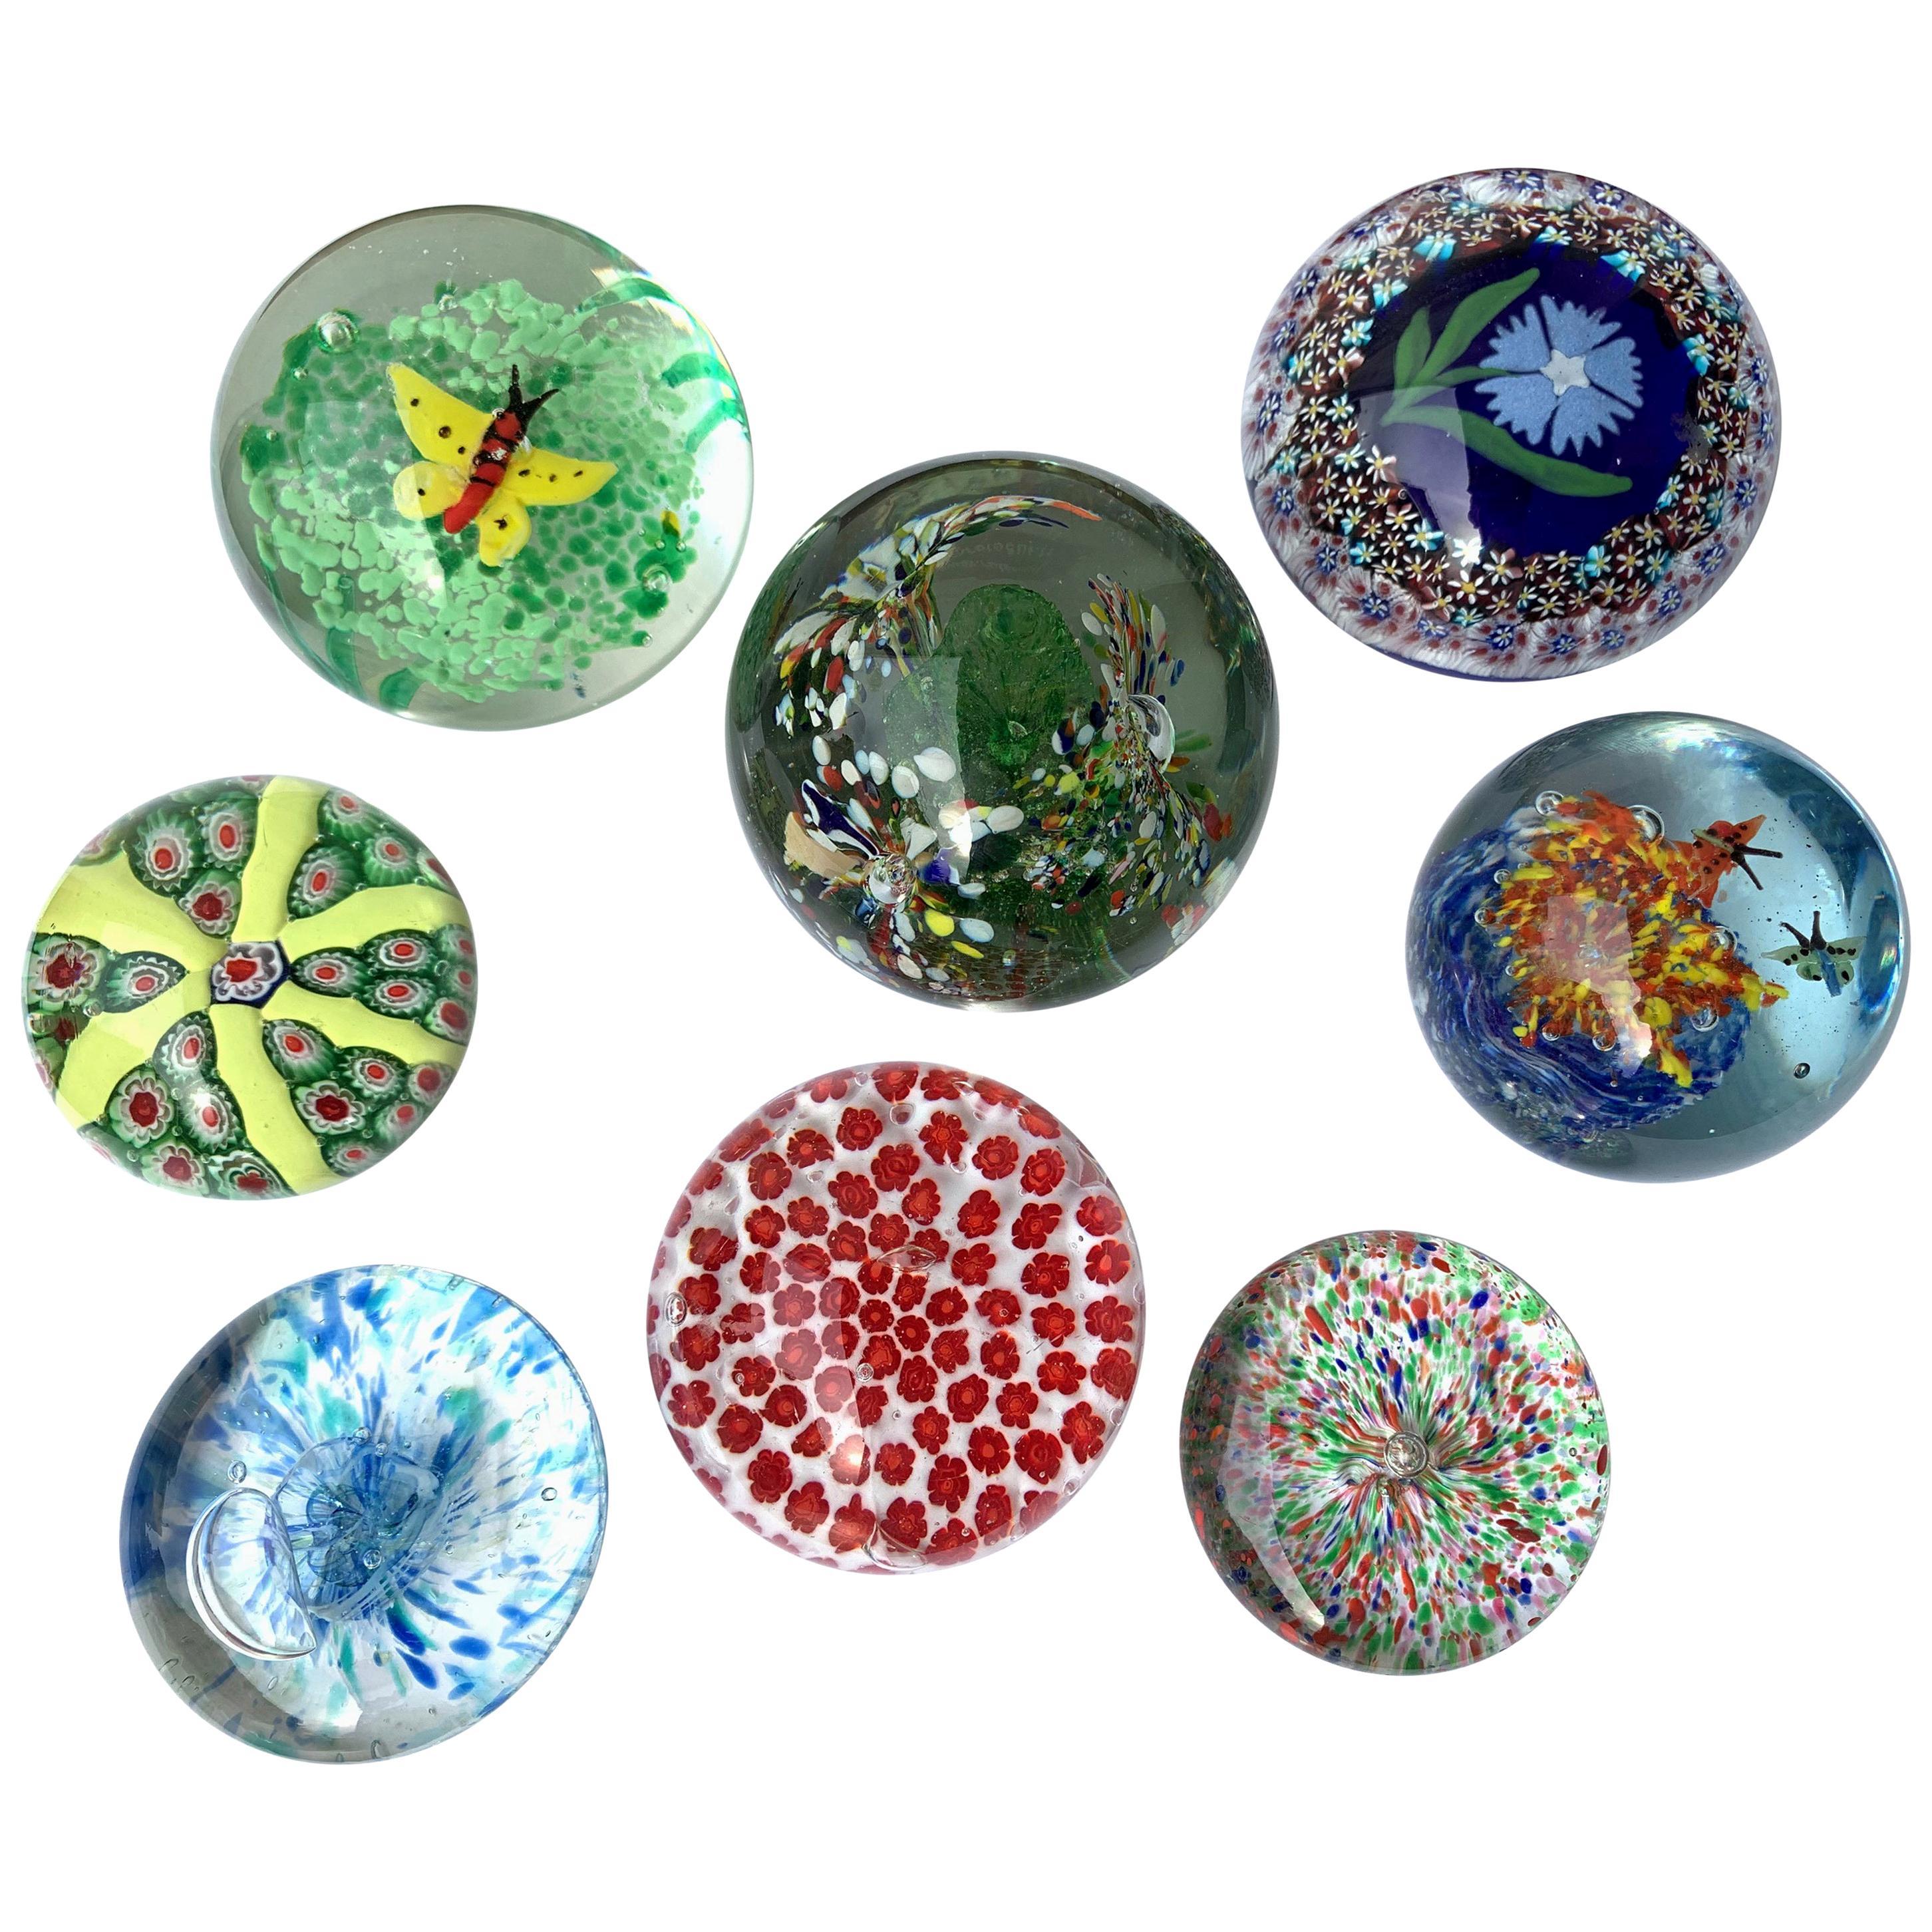 Set of Midcentury Murano Glass Italian Millefiori Collection Paperweight, 1980s